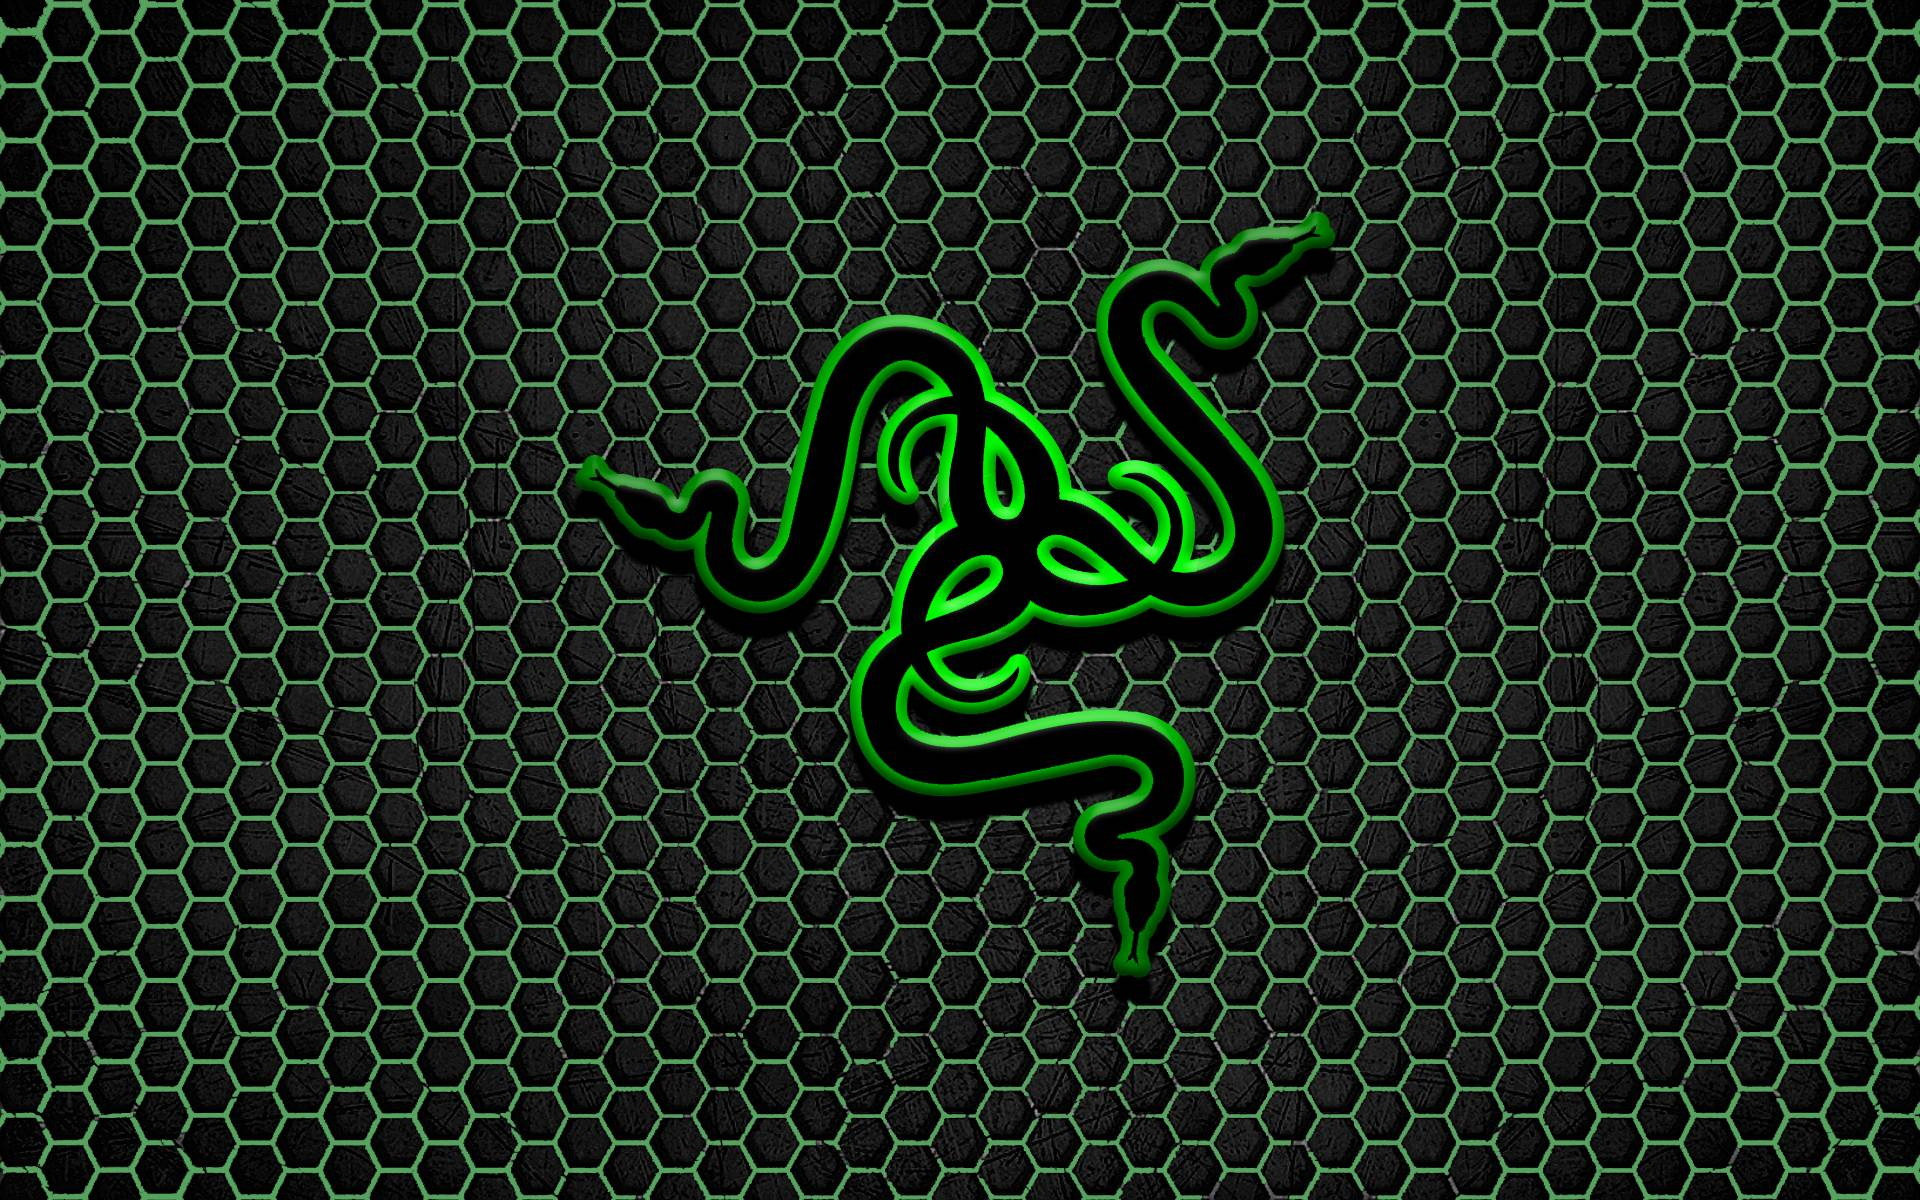 razor wallpaper computer - photo #4